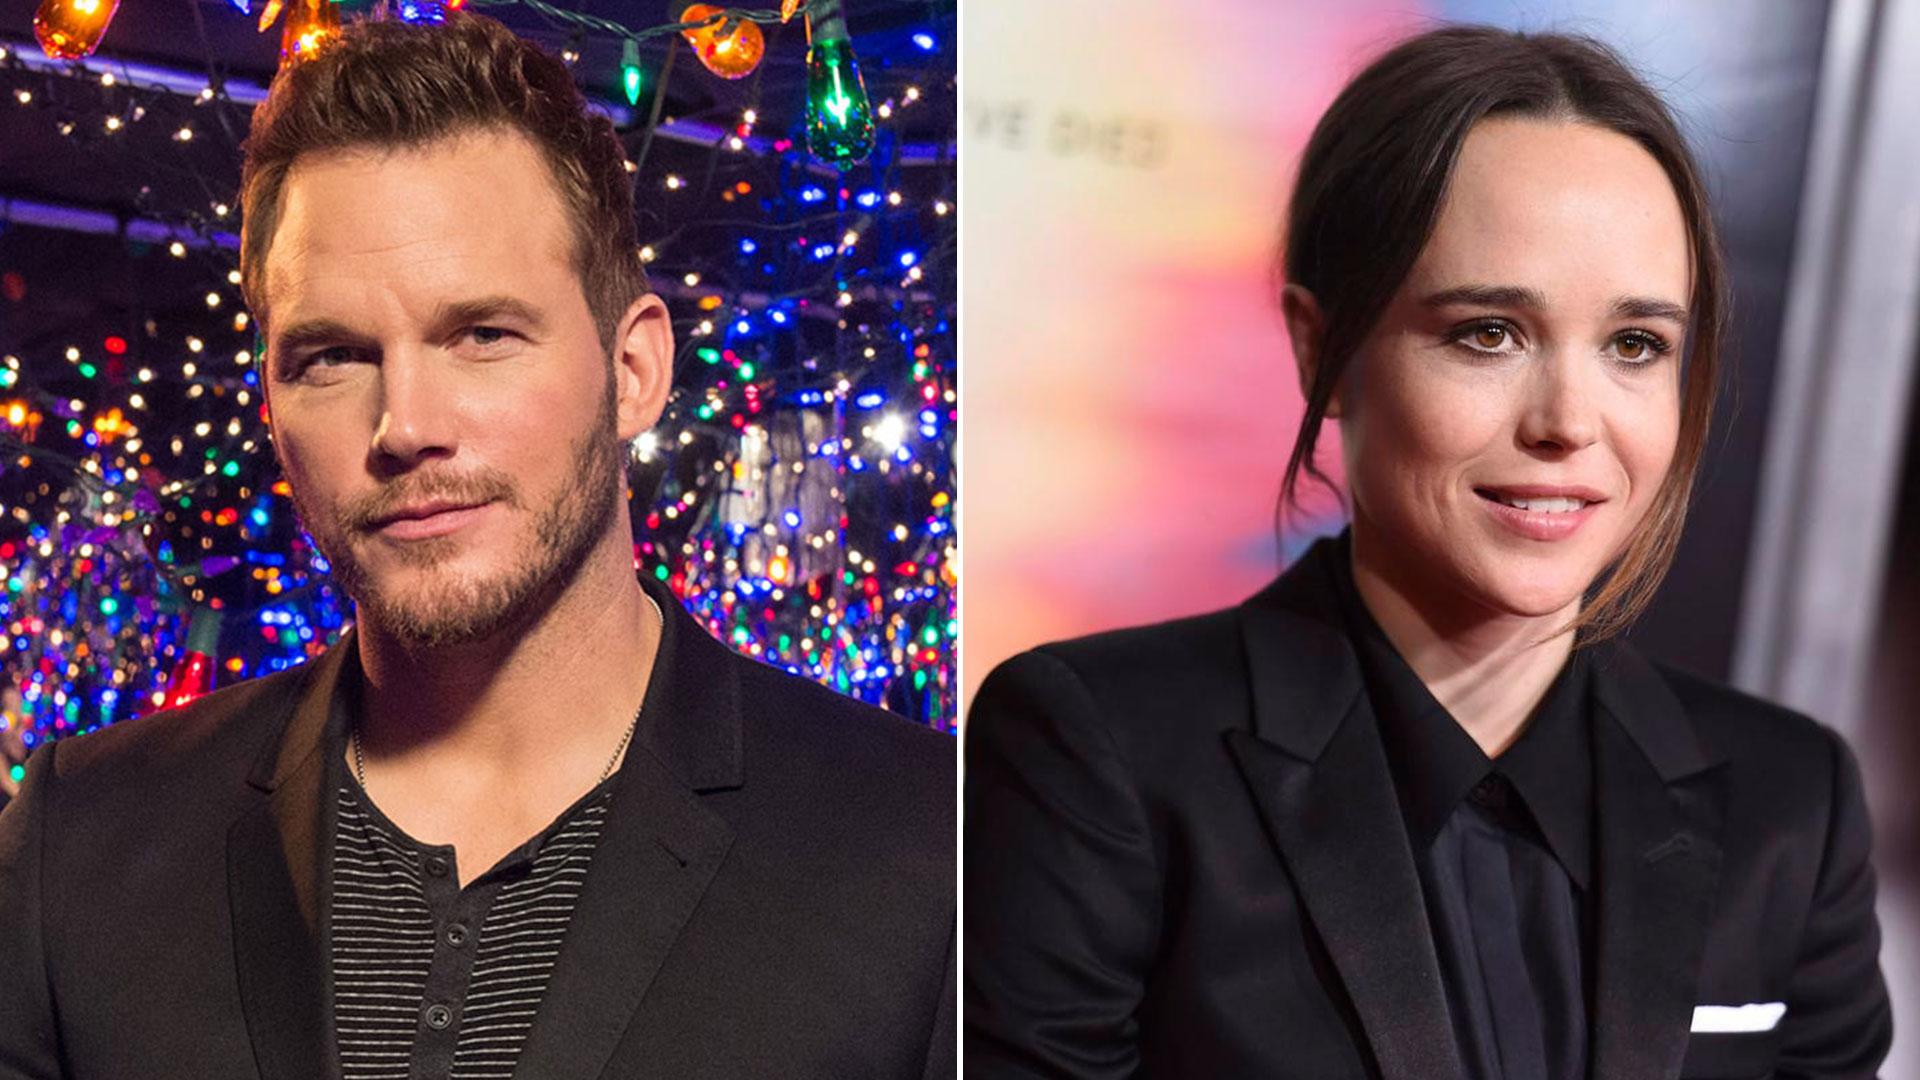 Ellen Page acusó a Chris Pratt de pertencer a una Iglesia anti-LGBTQ